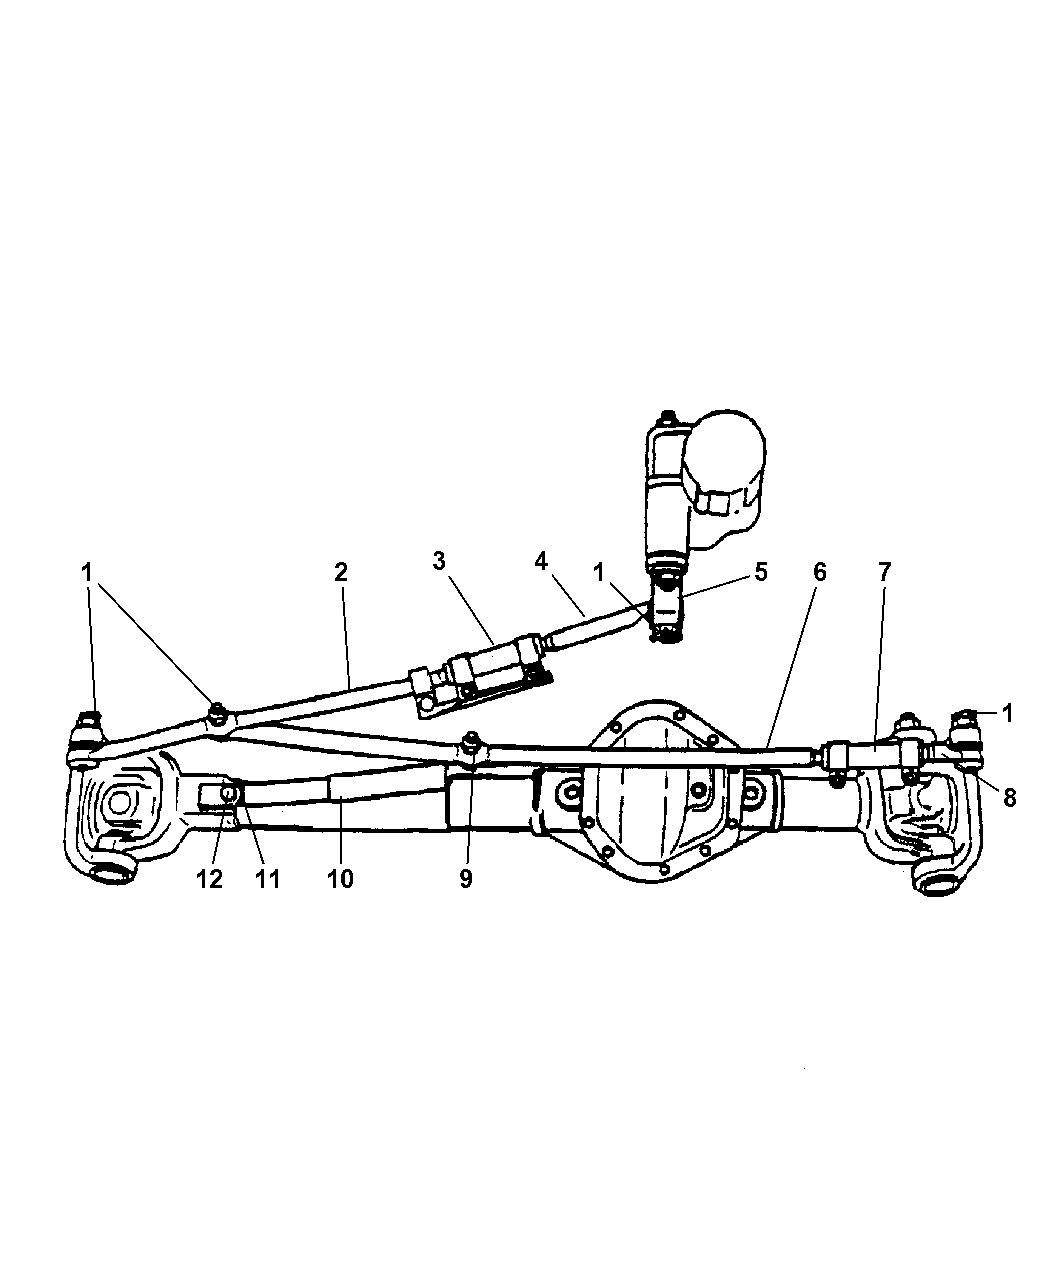 2004 Dodge Ram 2500 Steering Parts Diagram | Reviewmotors.co